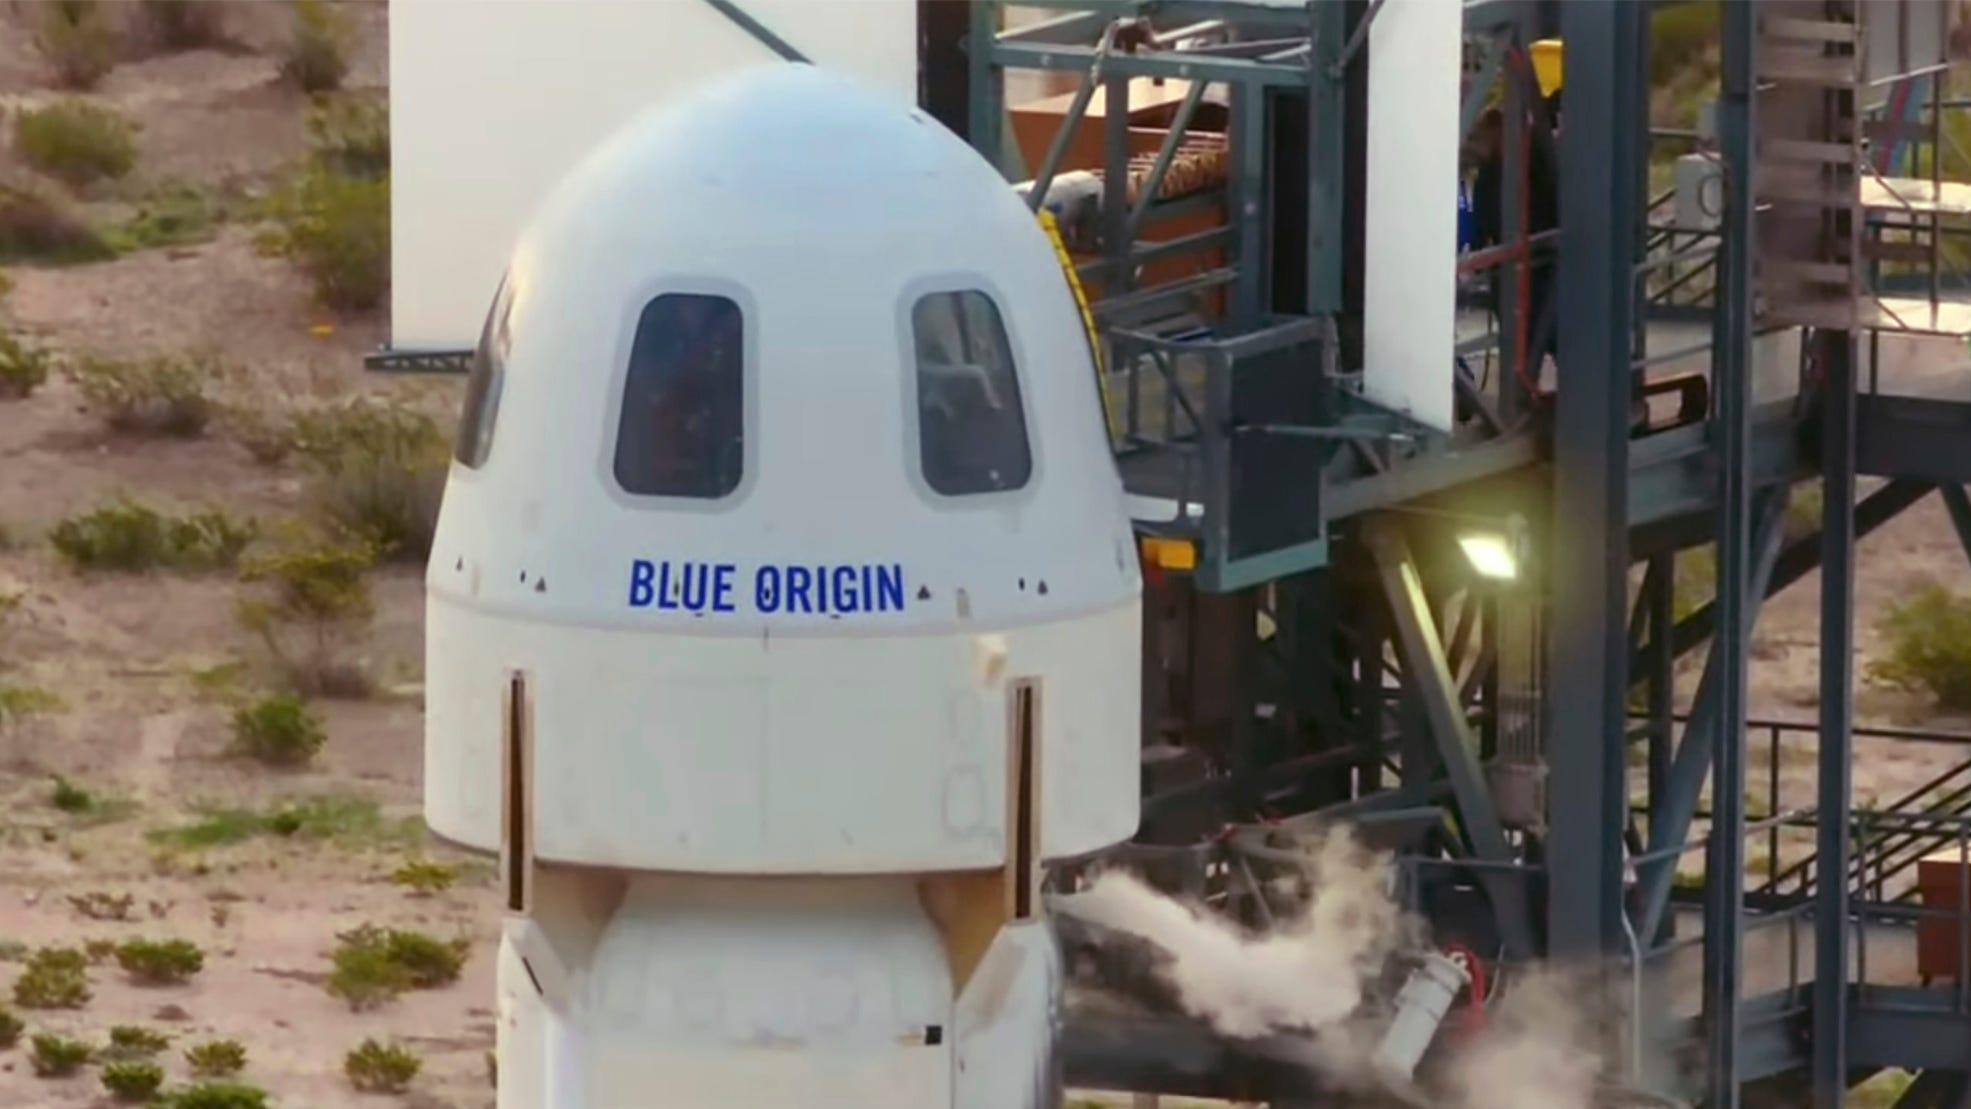 trek actor william shatner among crew of blue origin